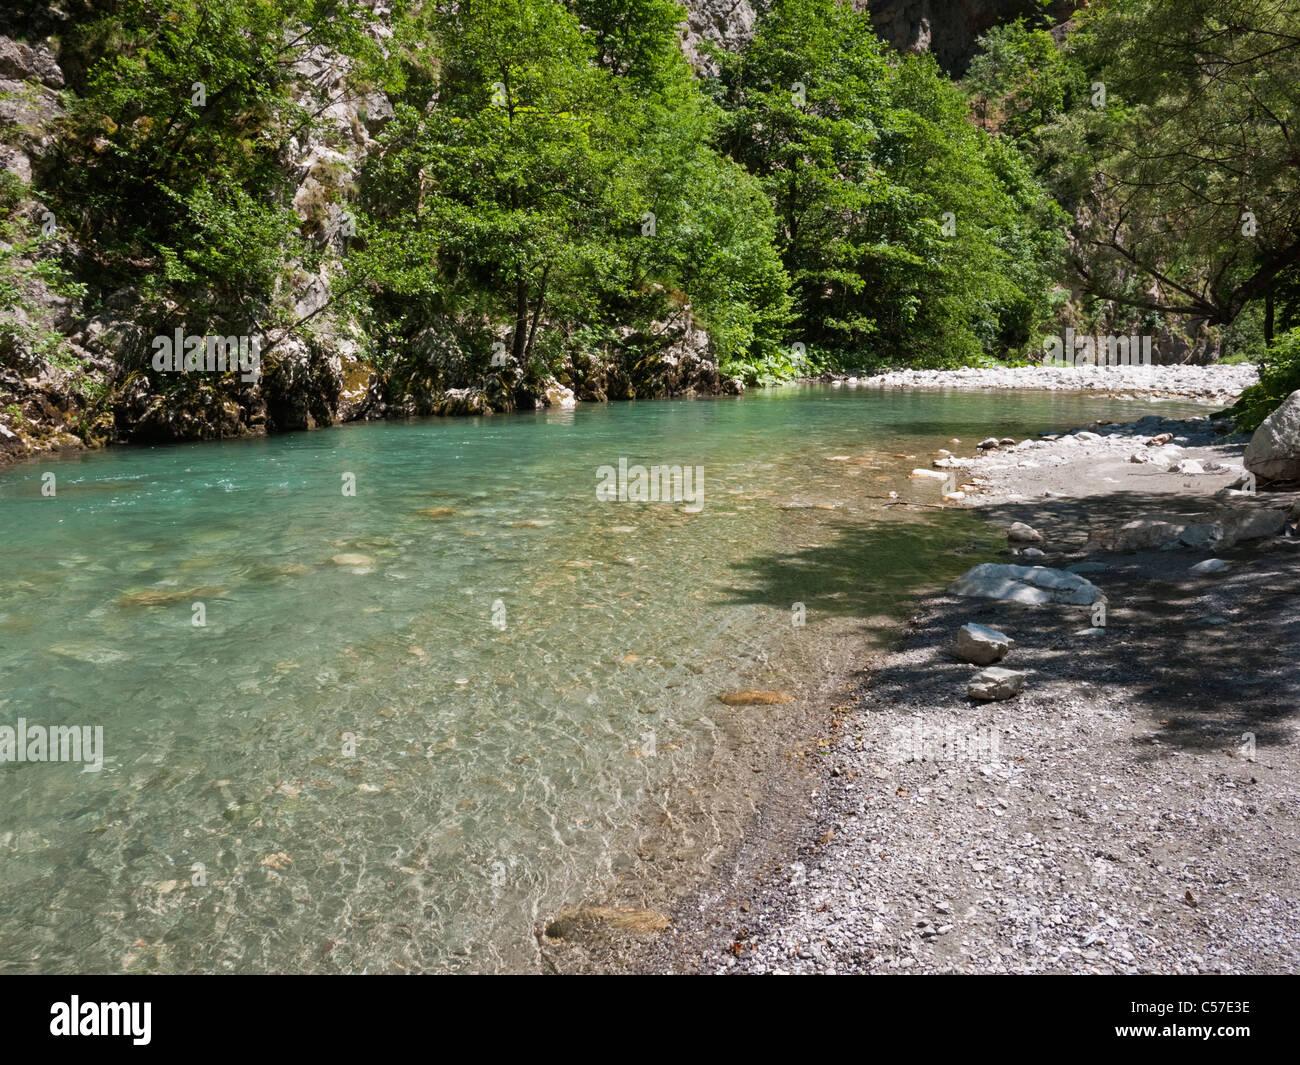 The river Radika flowing through the Radika gorge in Mavrovo National Park, Macedonia - Stock Image